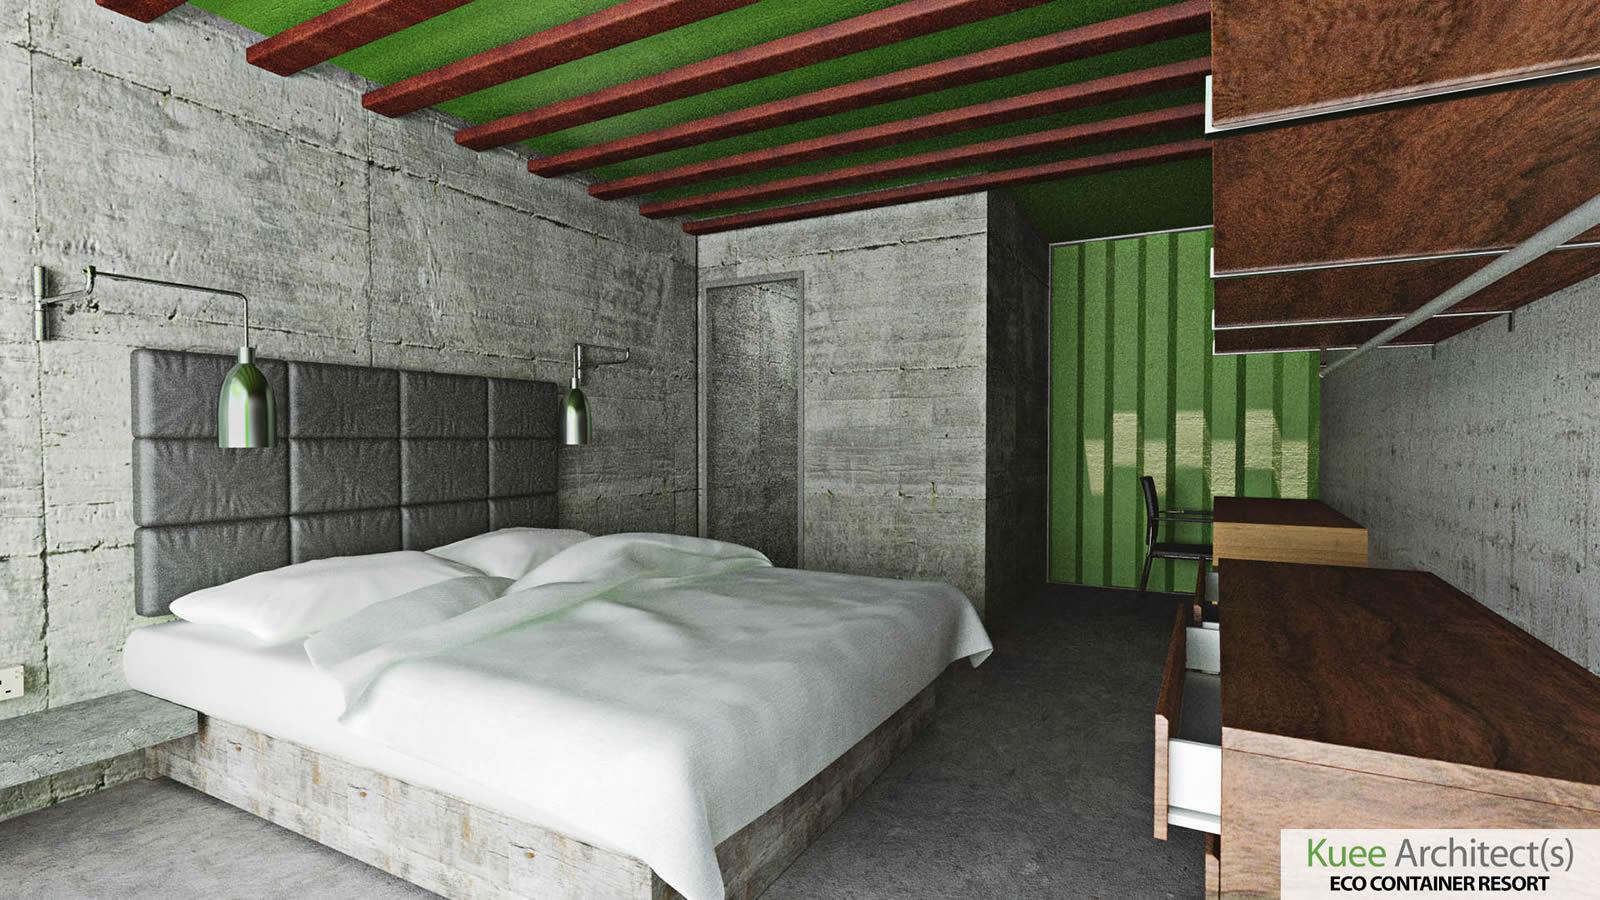 container interior design Kuee architect